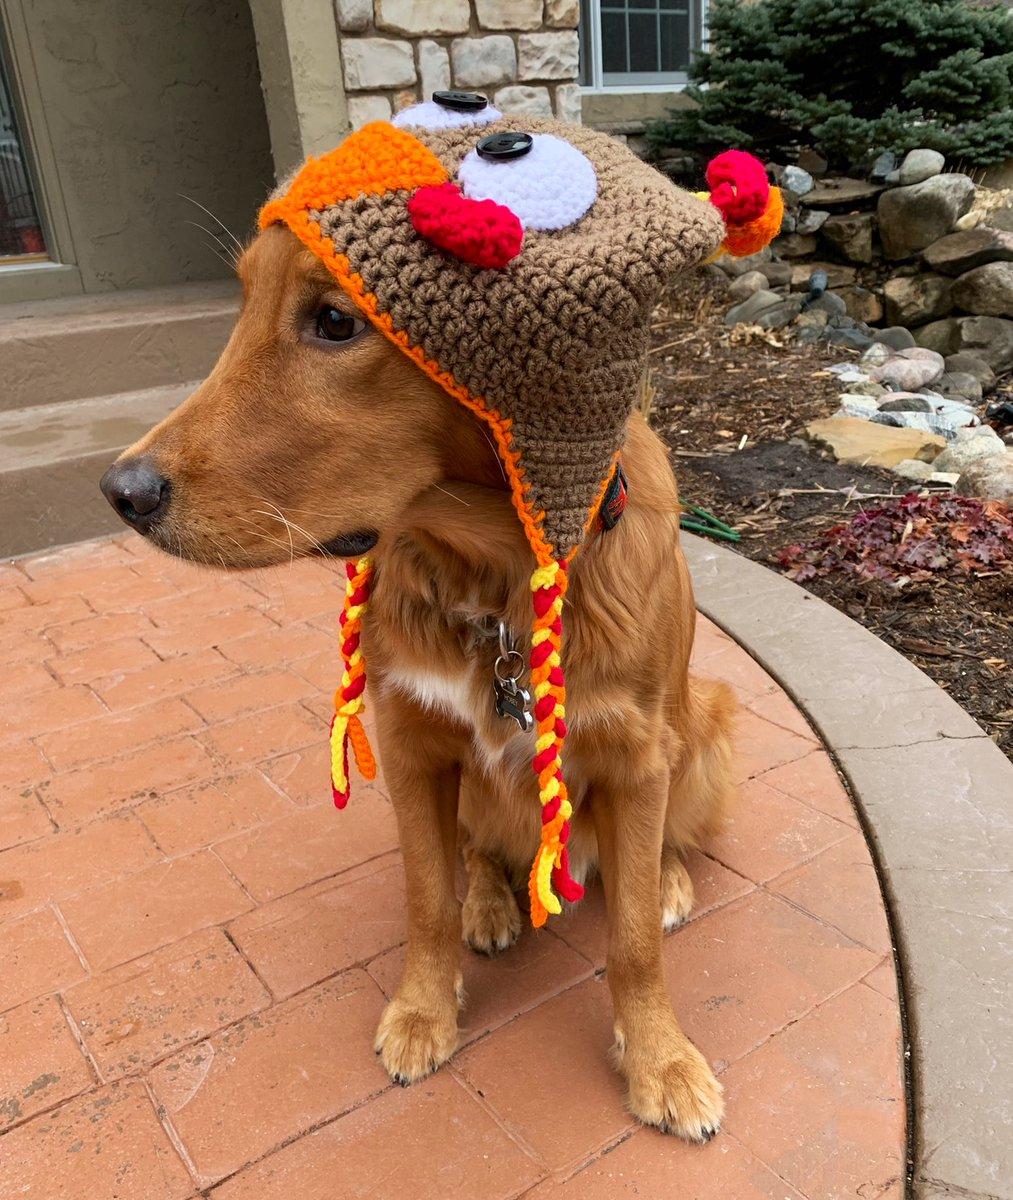 gobble gobble 🦃  it's turkey times!!! happys thanksgiving 😀 https://t.co/Ki6HeNsT0L